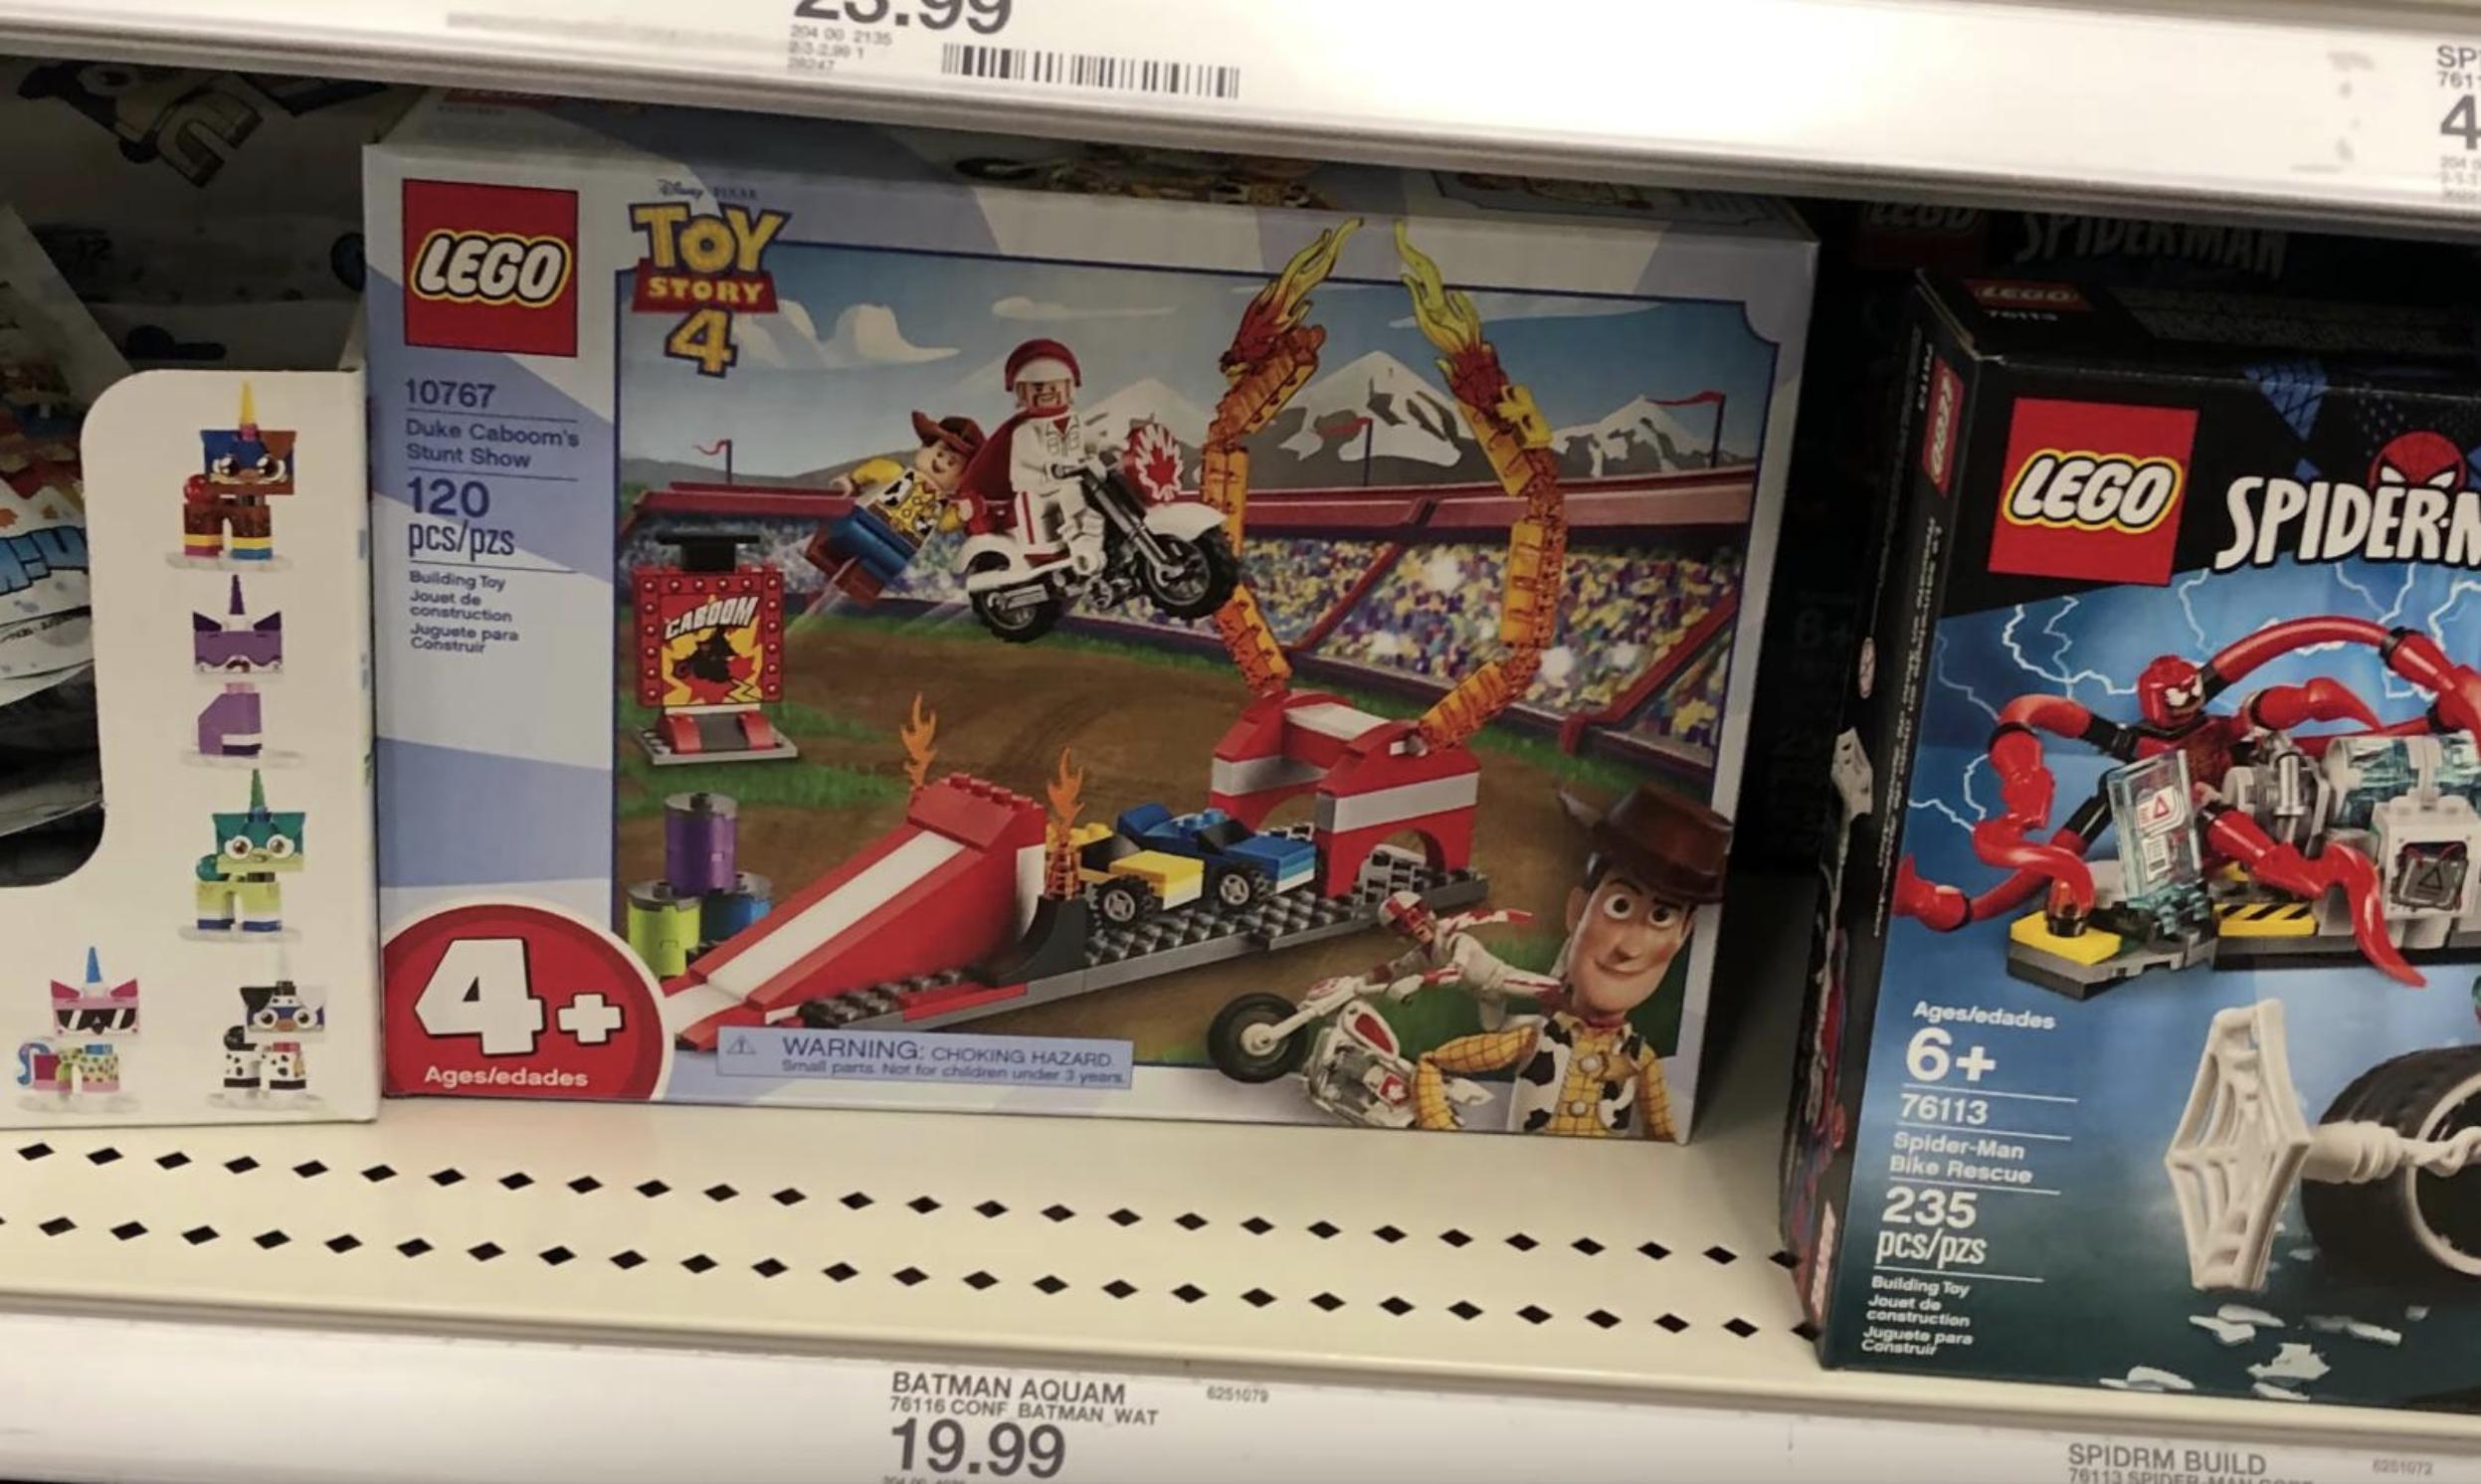 LEGO 10767 Disney Pixars Toy Story 4 Duke Caboom/'s Stunt Show Building Toy Set